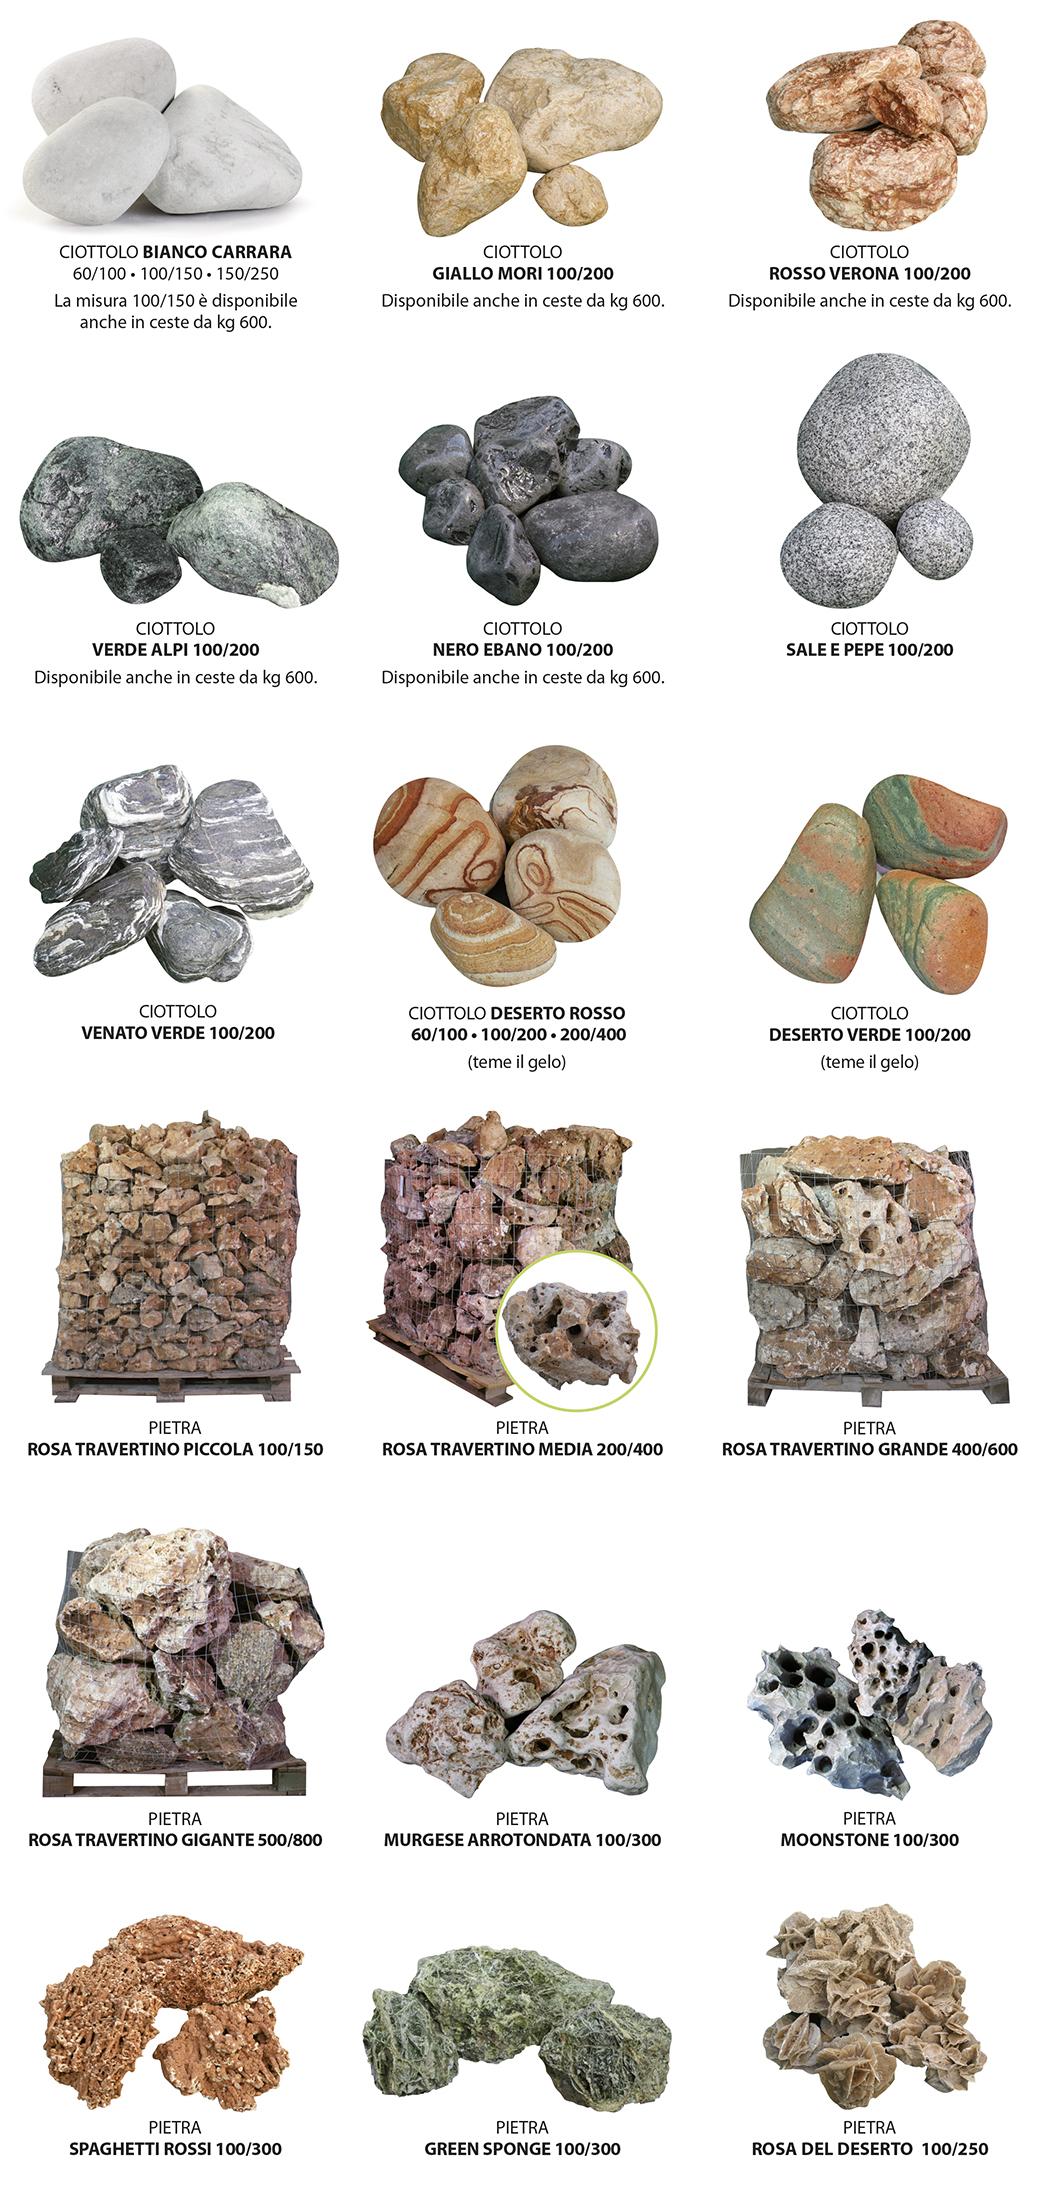 ciottoli e pietre in ceste